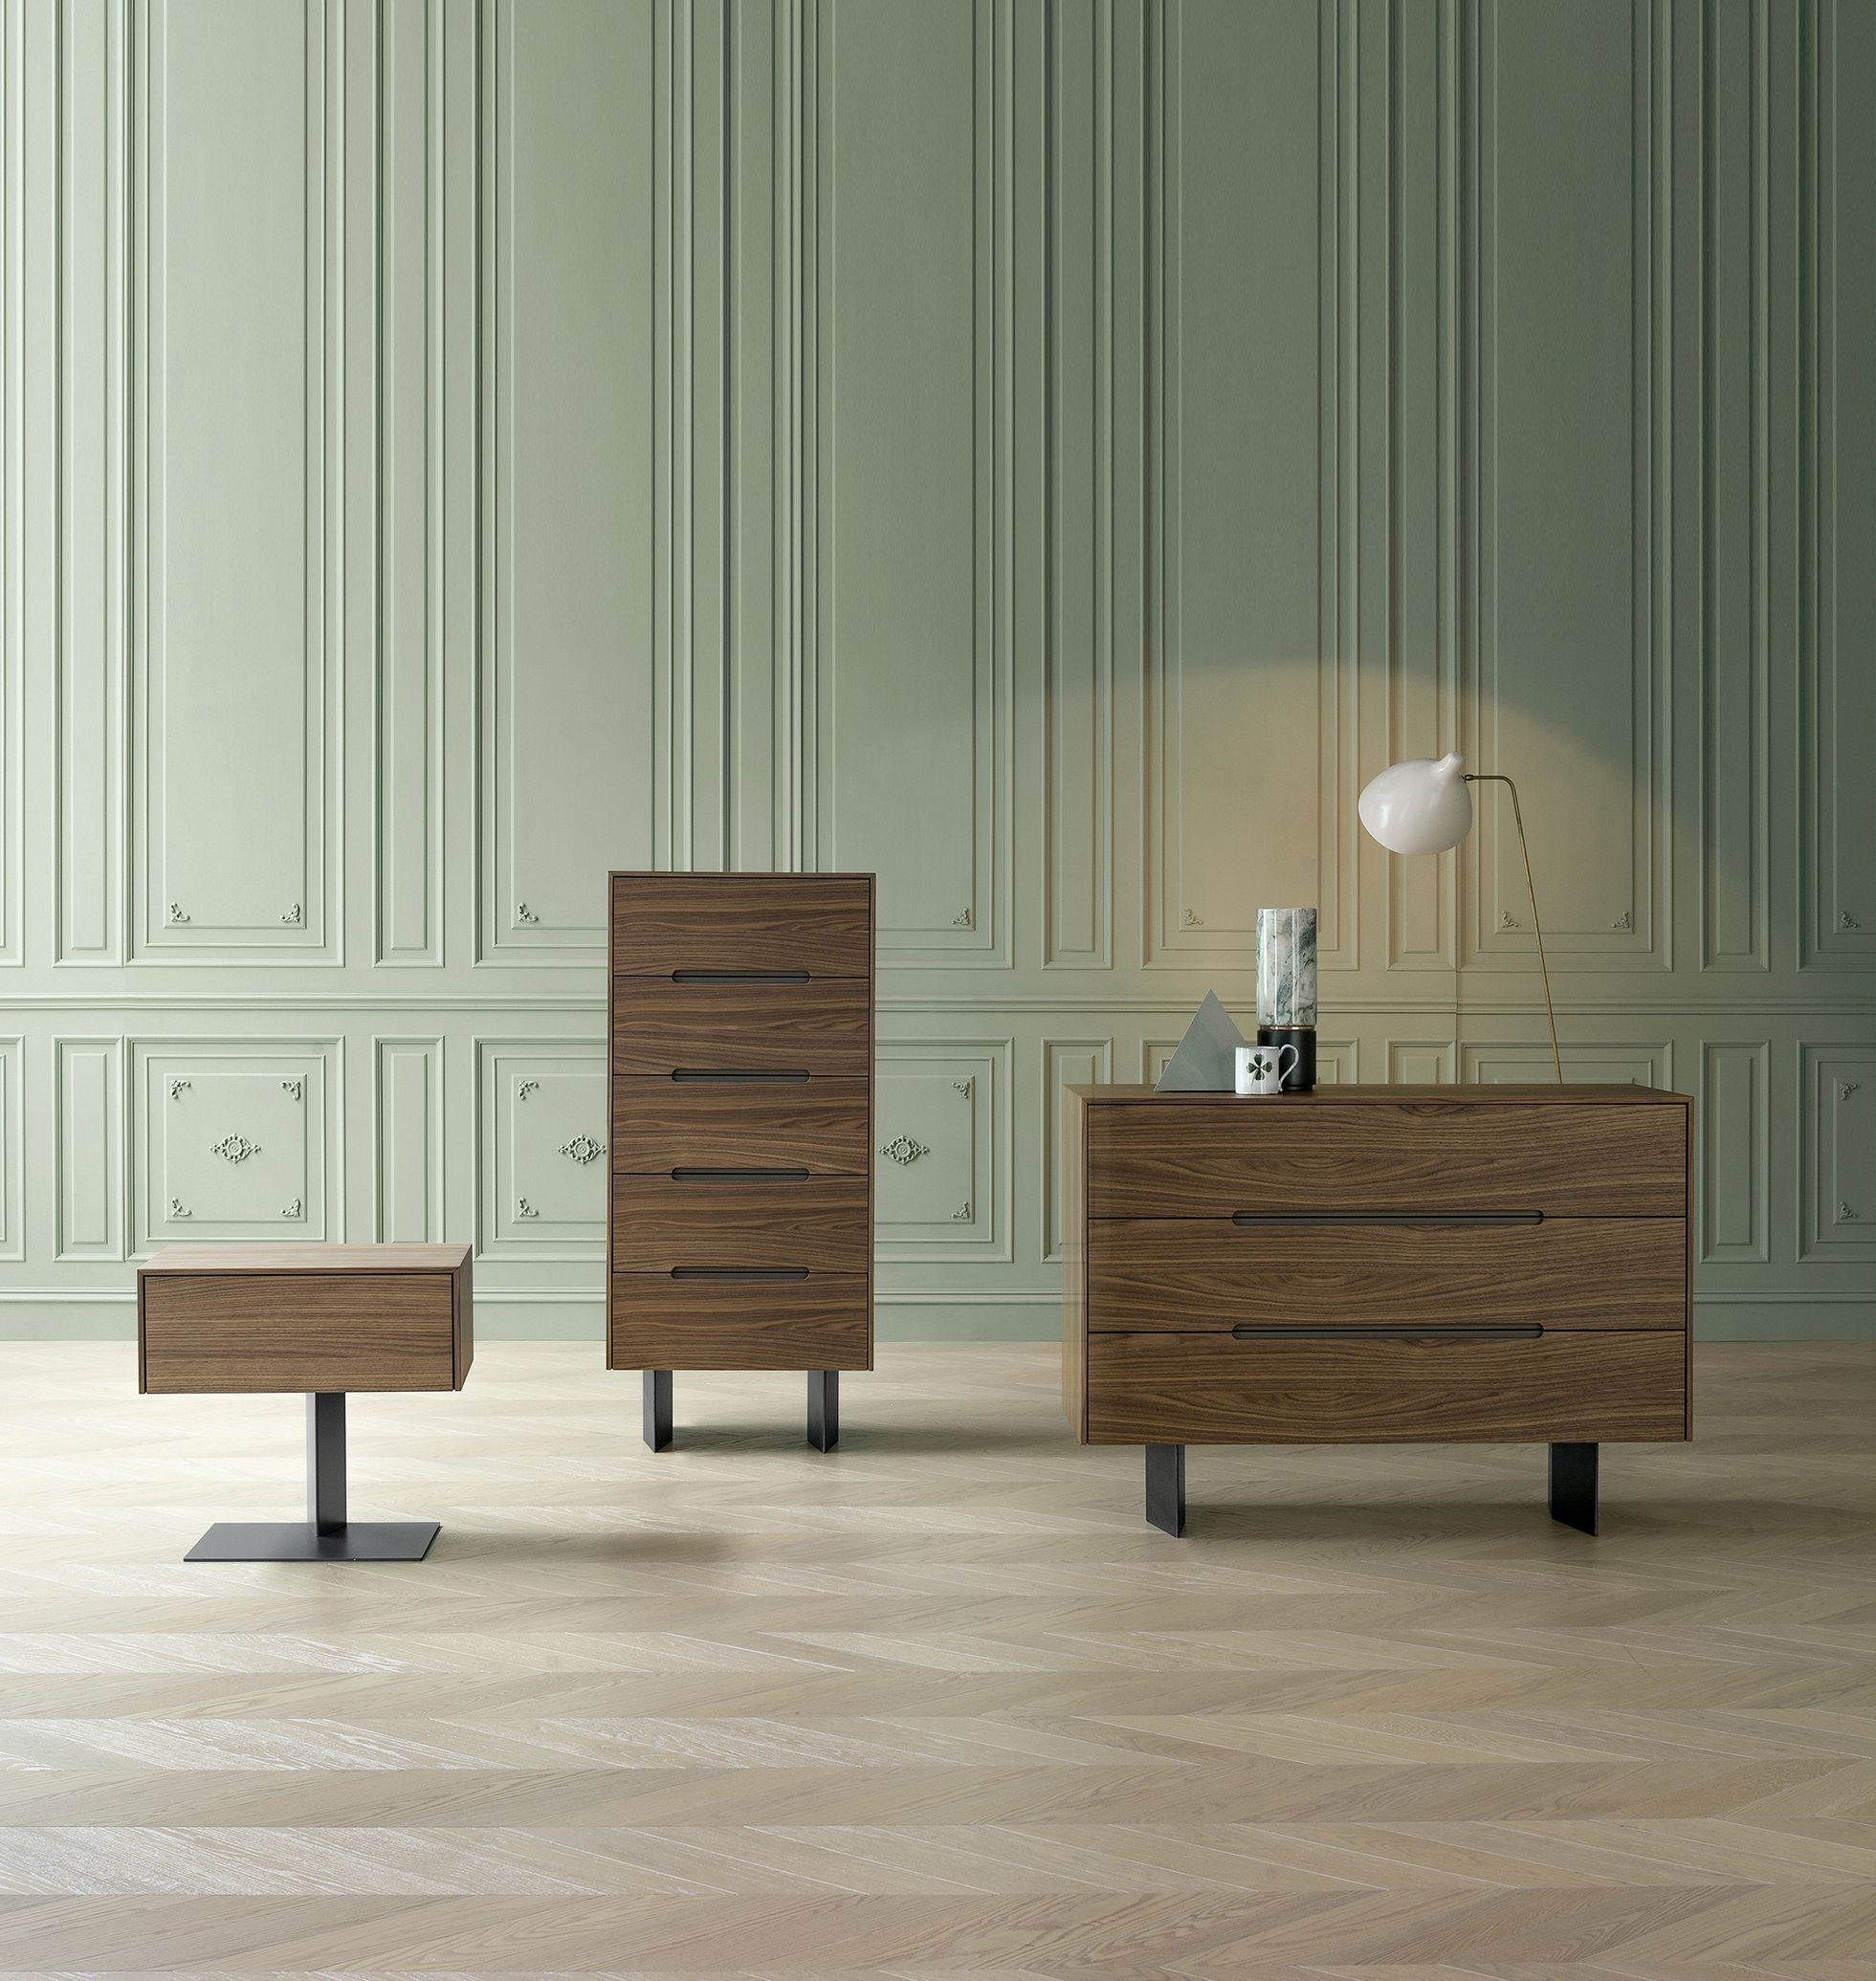 wai collection by mario mazzer for bonaldo slaapkamer commode design bedroom